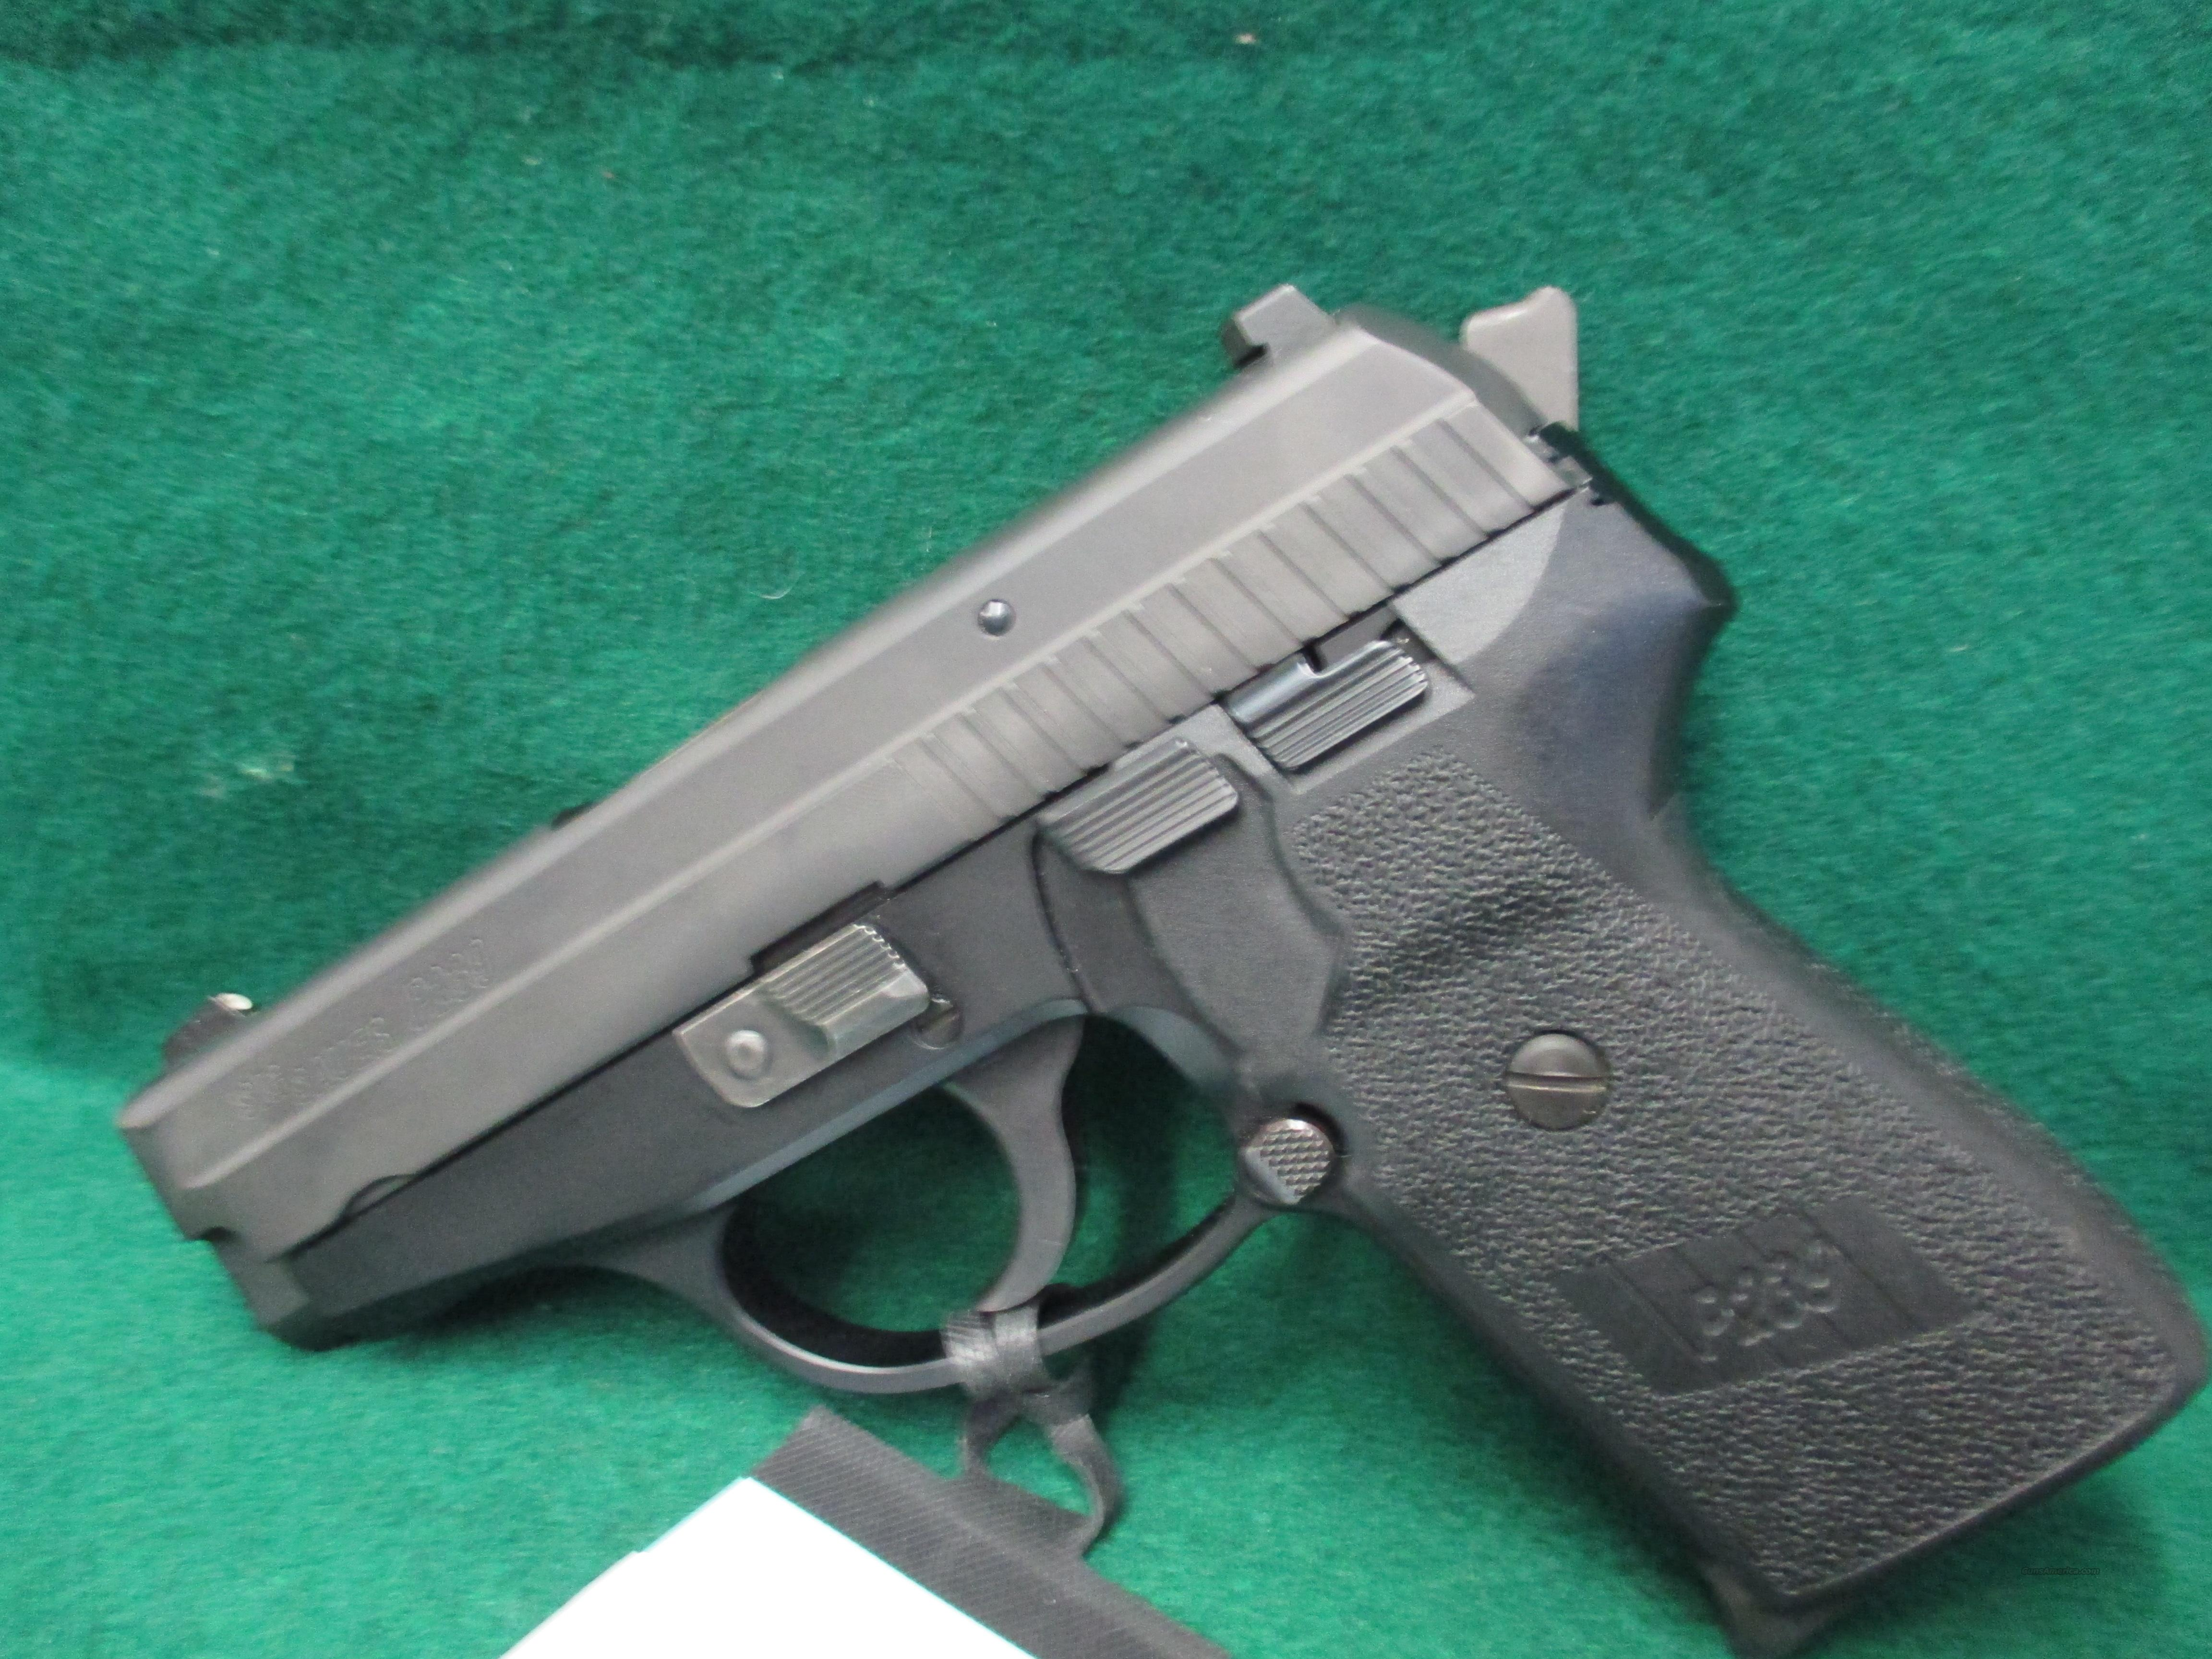 Sig Sauer P239   Guns > Pistols > Sig - Sauer/Sigarms Pistols > P239